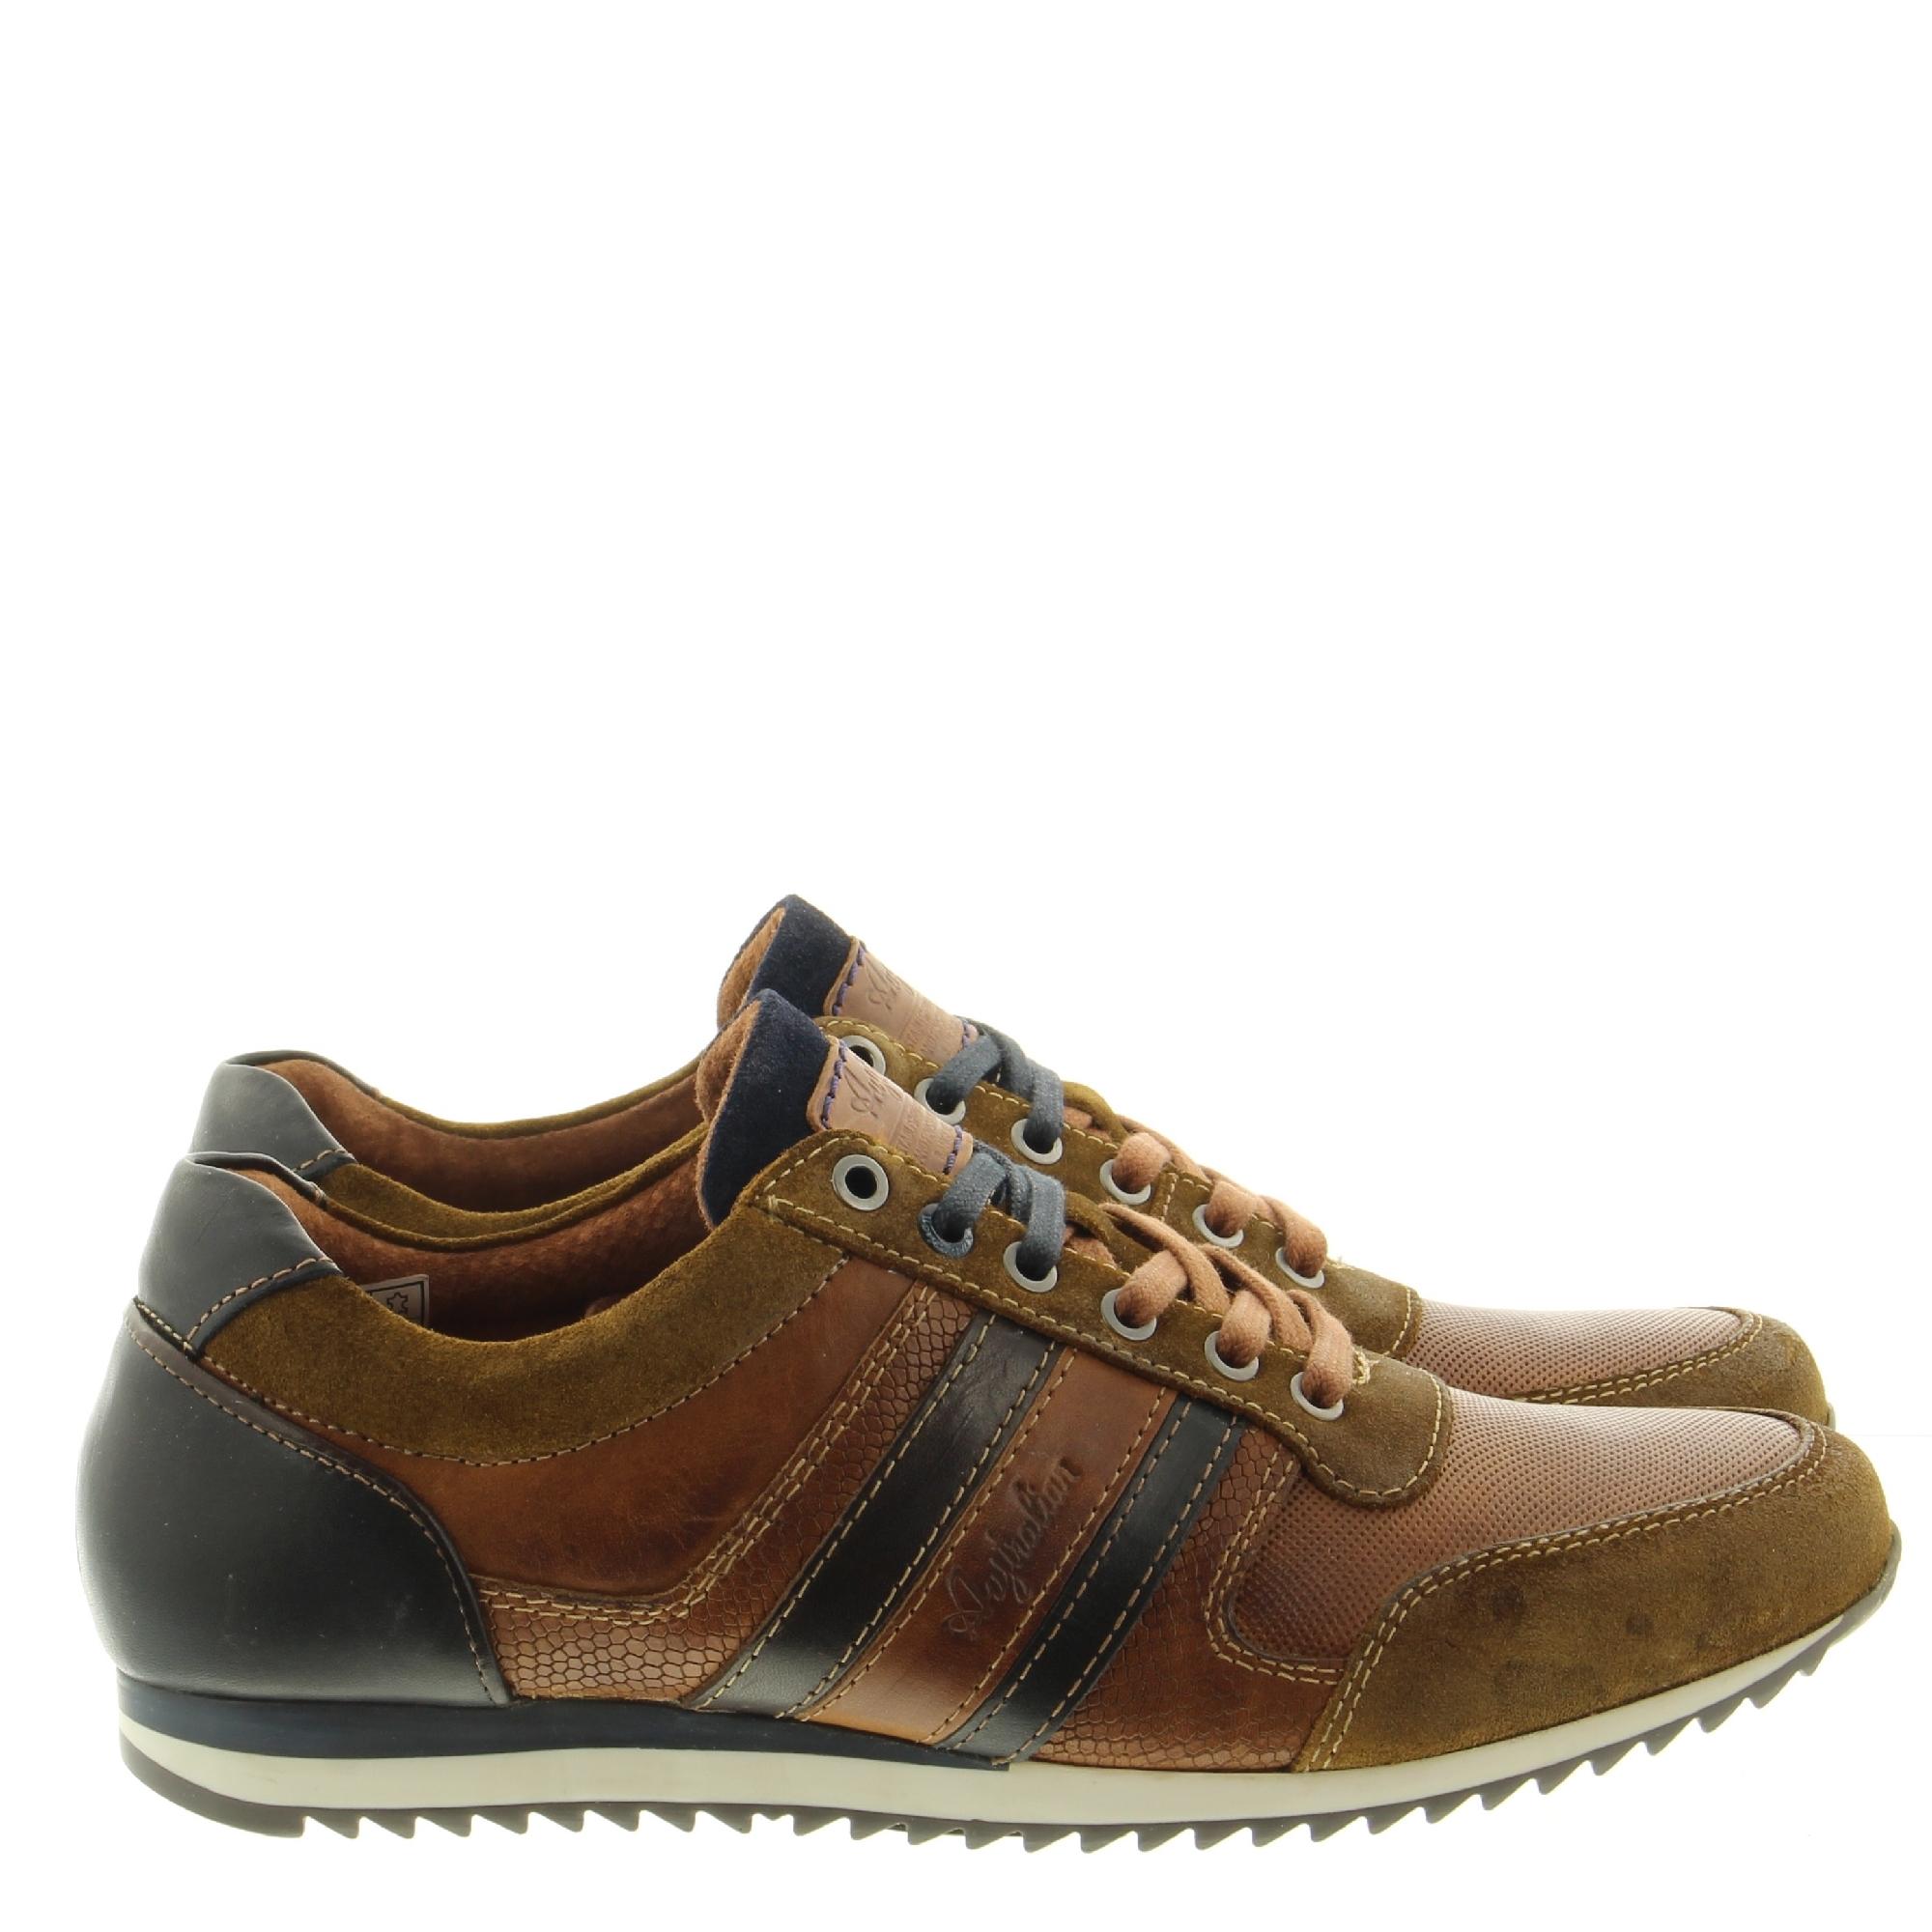 Australian Footwear Cornwall 15.1351.02 T15 Tan Combi